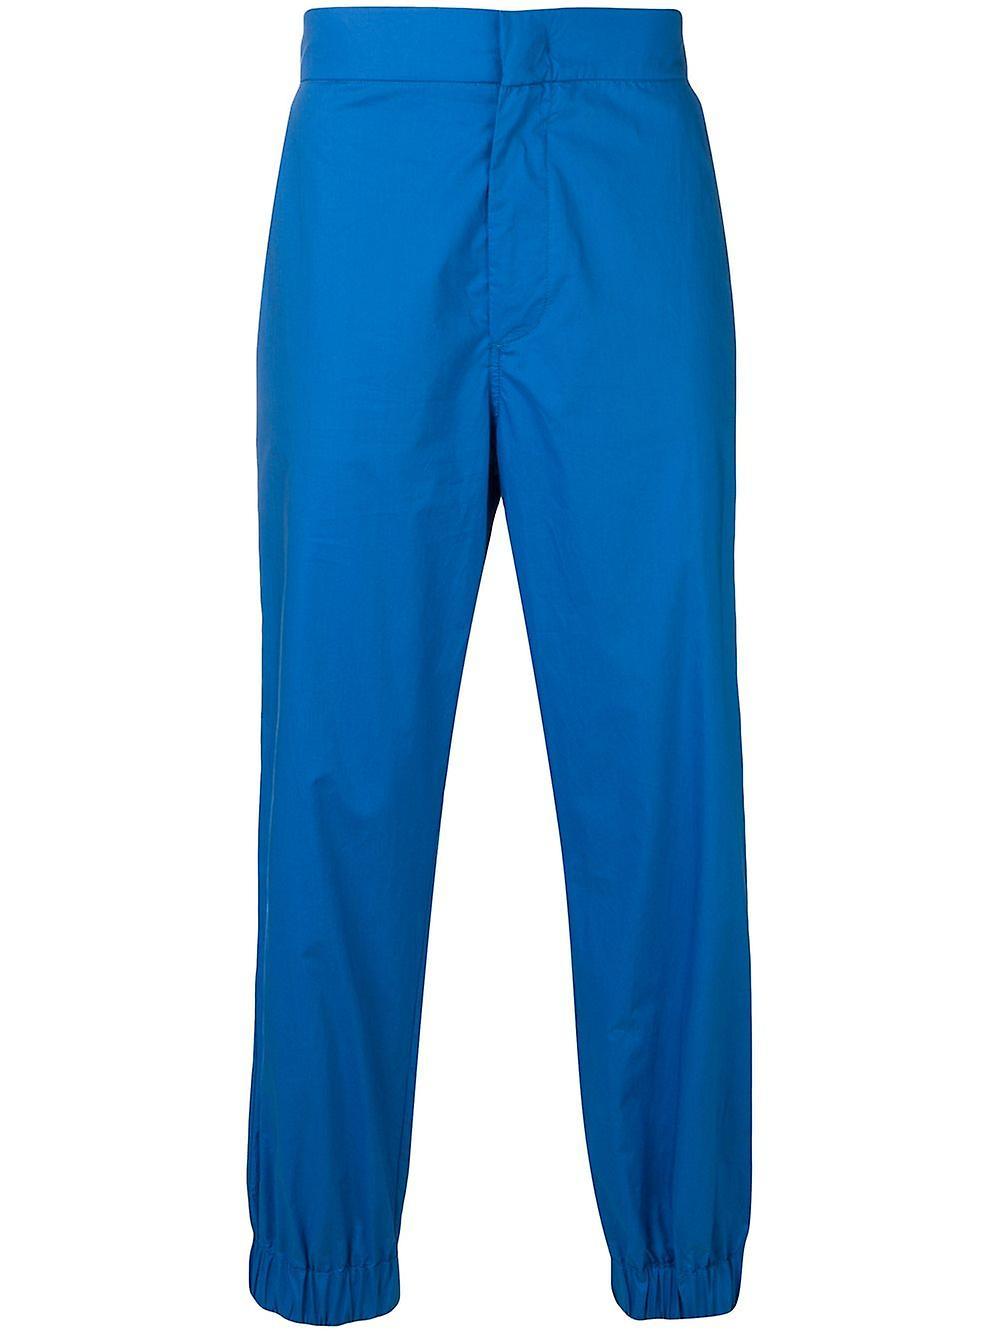 5 Moncler Genius X Craig Green Logo Pants